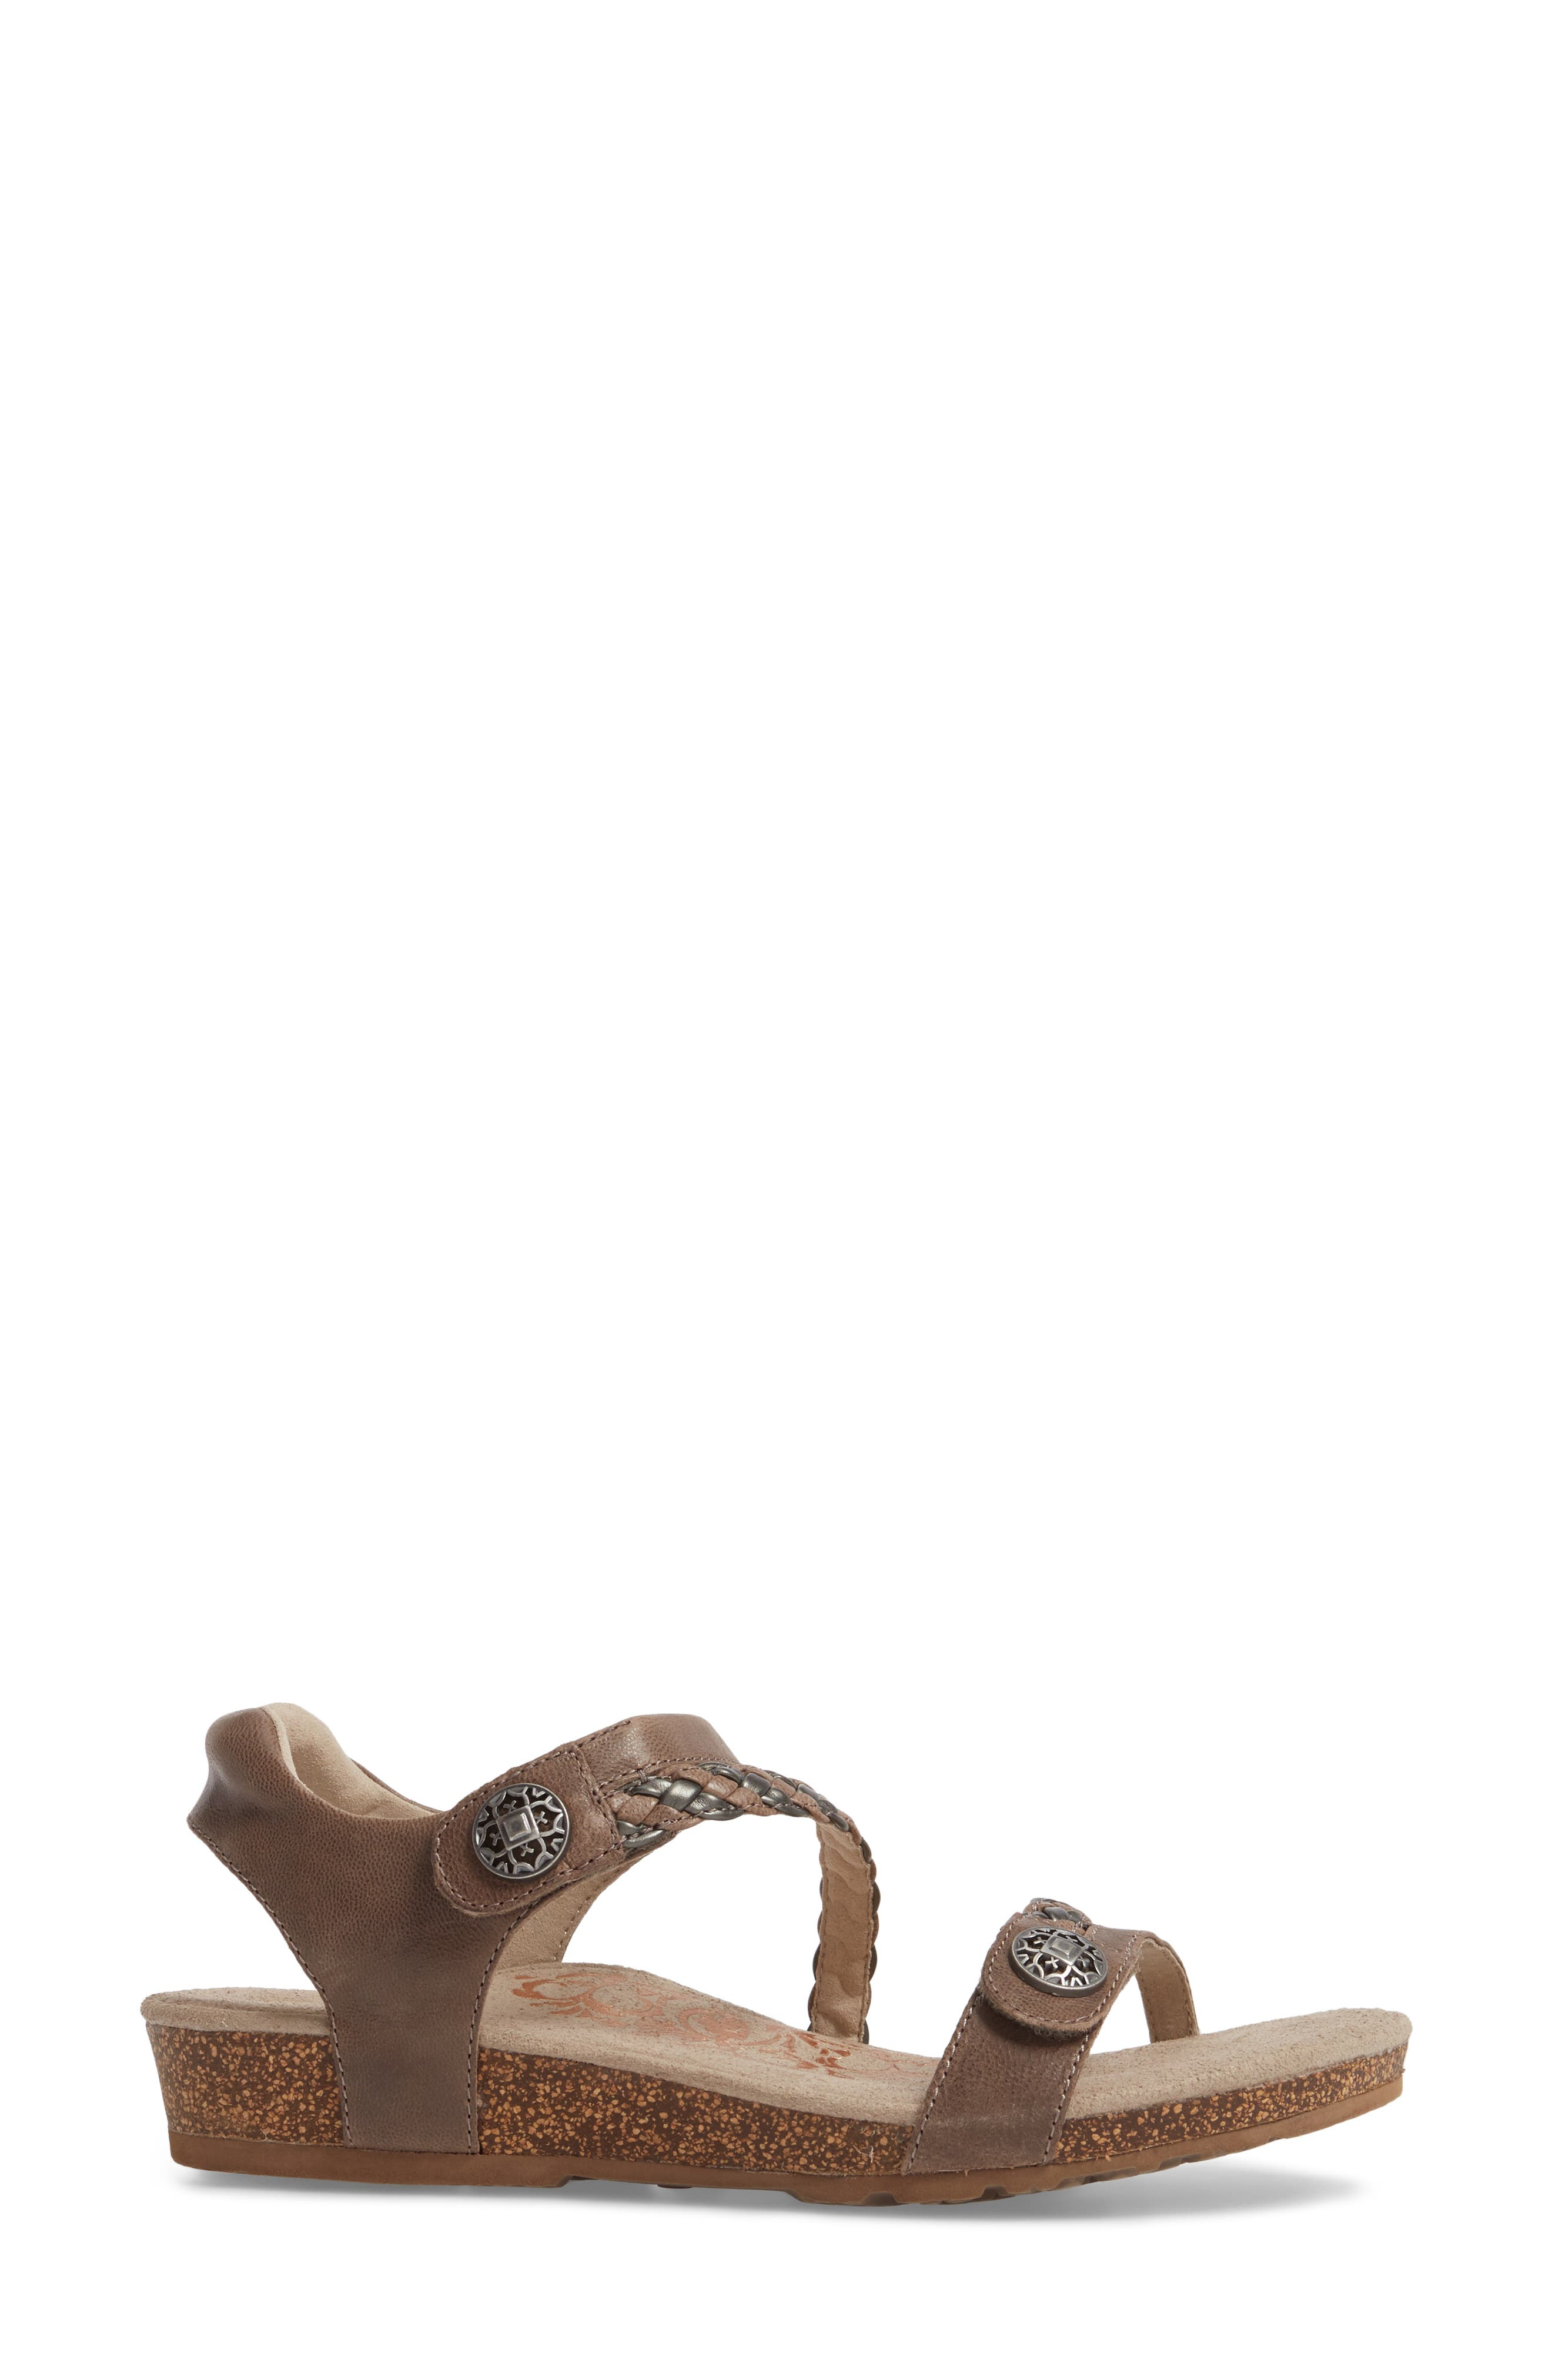 'Jillian' Braided Leather Strap Sandal,                             Alternate thumbnail 3, color,                             GREY LEATHER